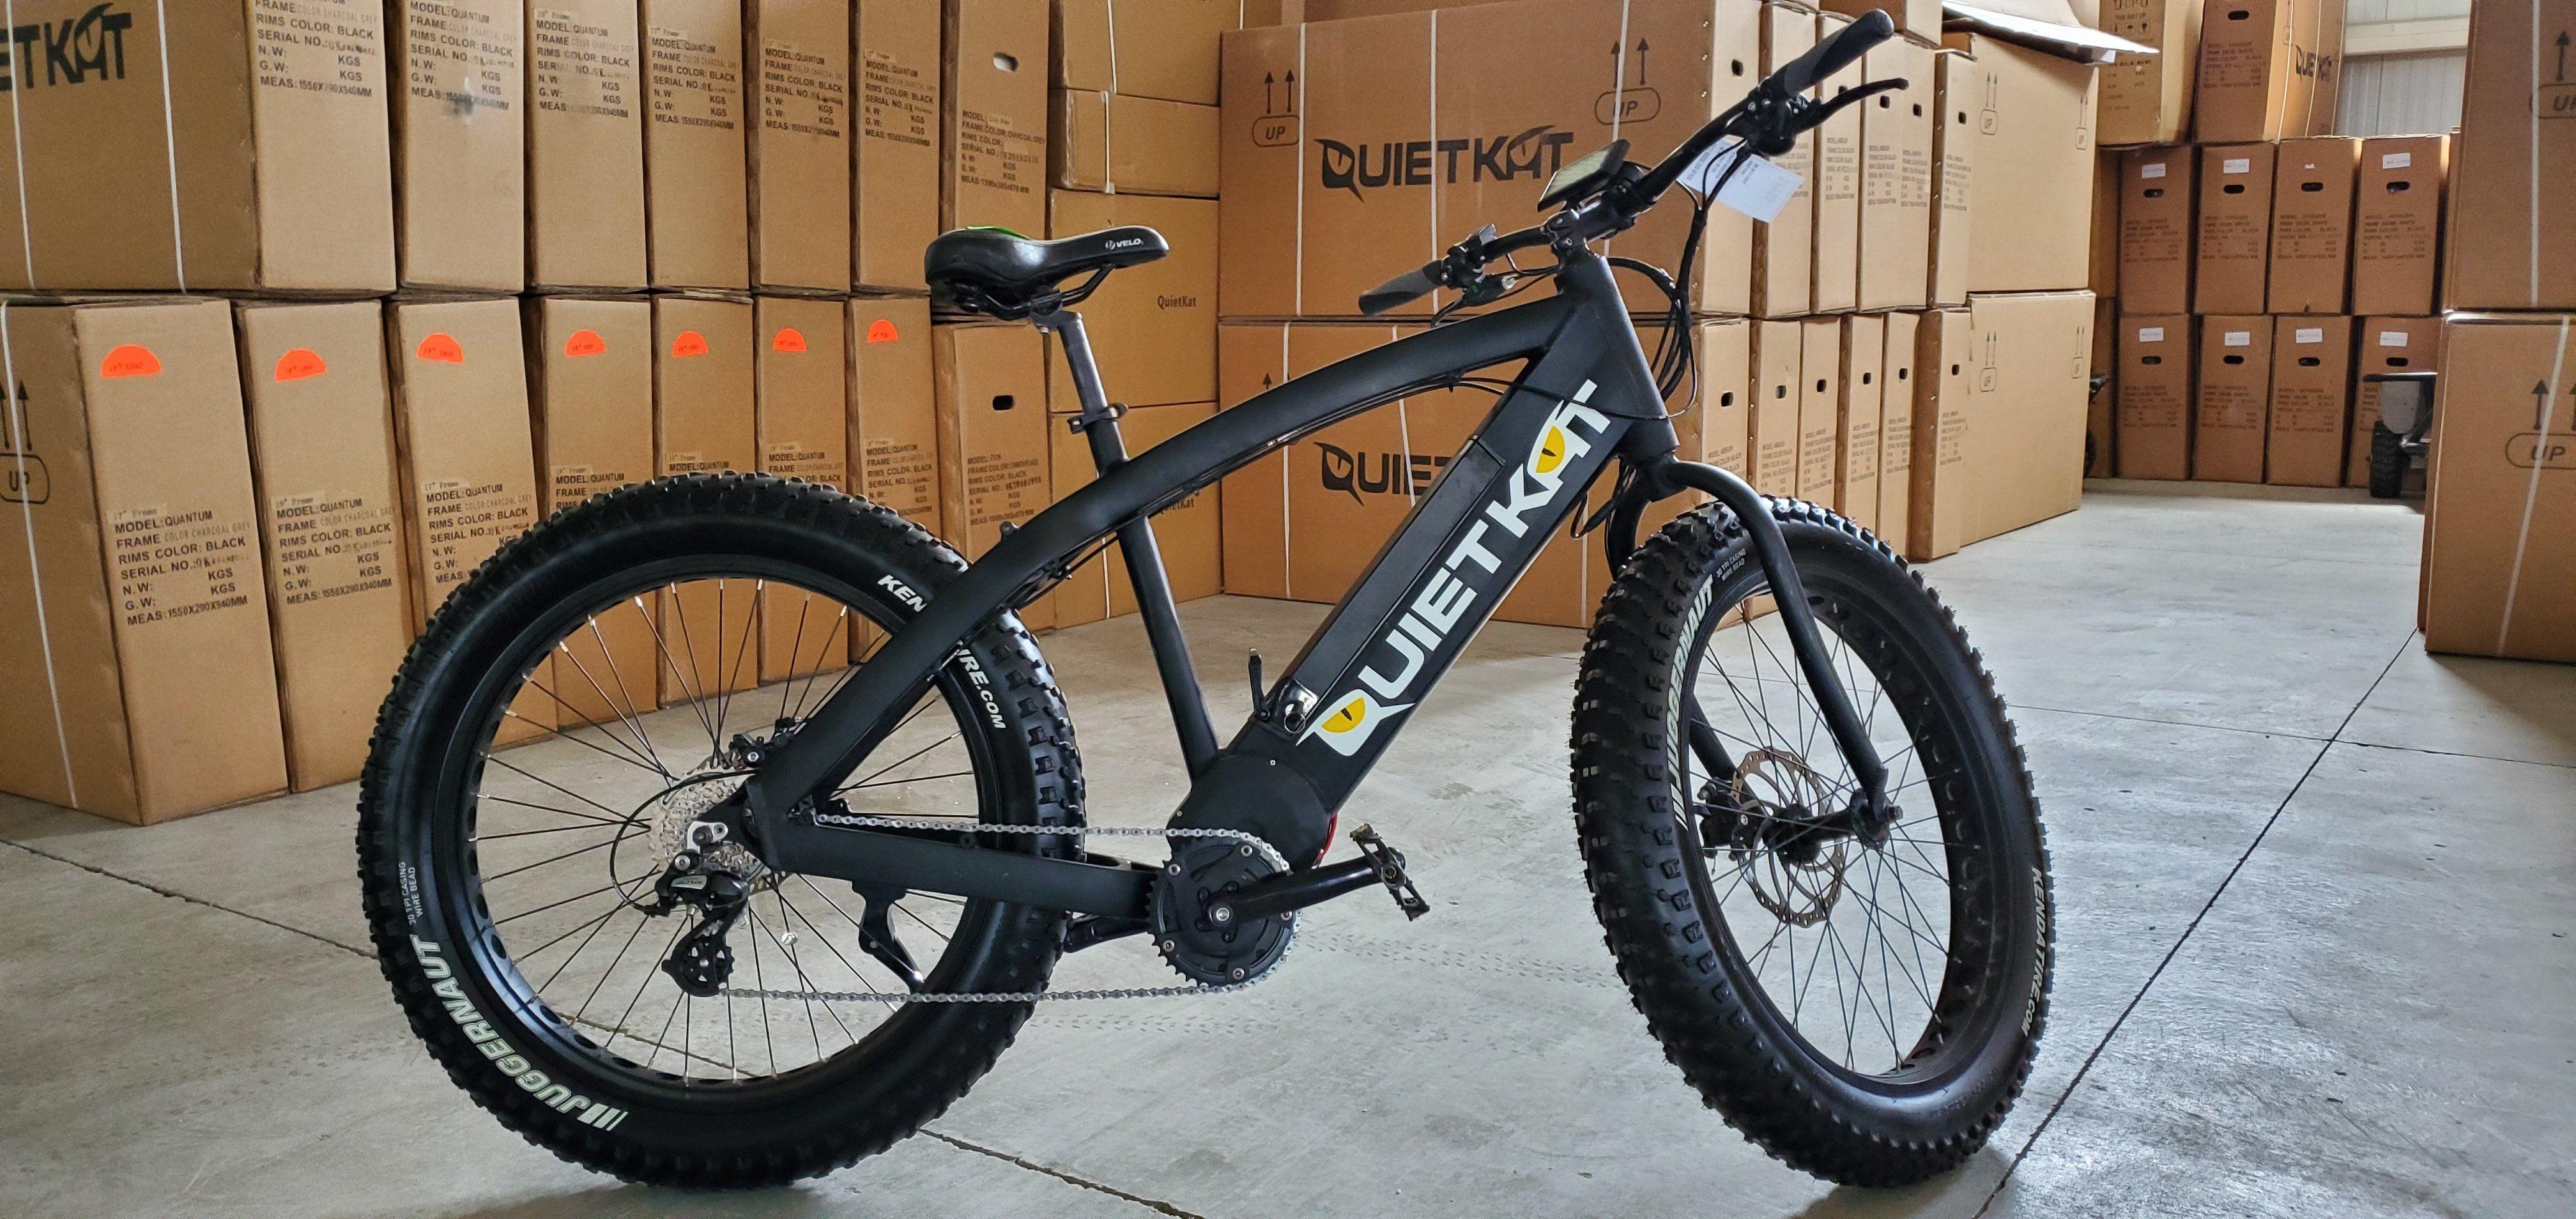 Quietkat 2017 Ranger Electric Mountain Bike Qkeco 750 Demo 803